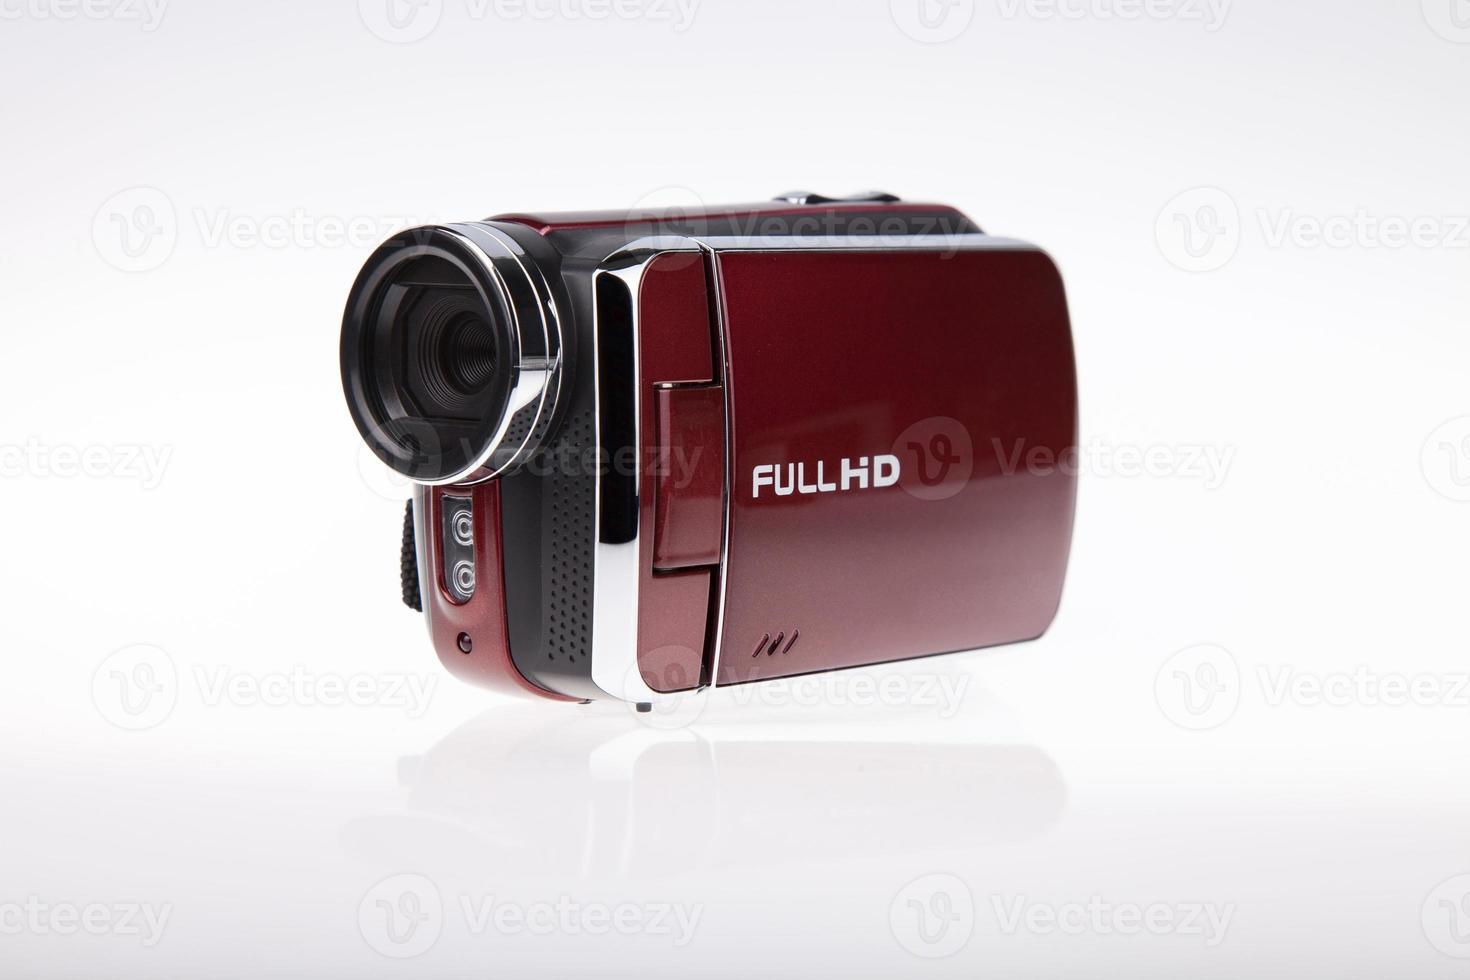 videocamera videocamera full hd - immagini di stock foto